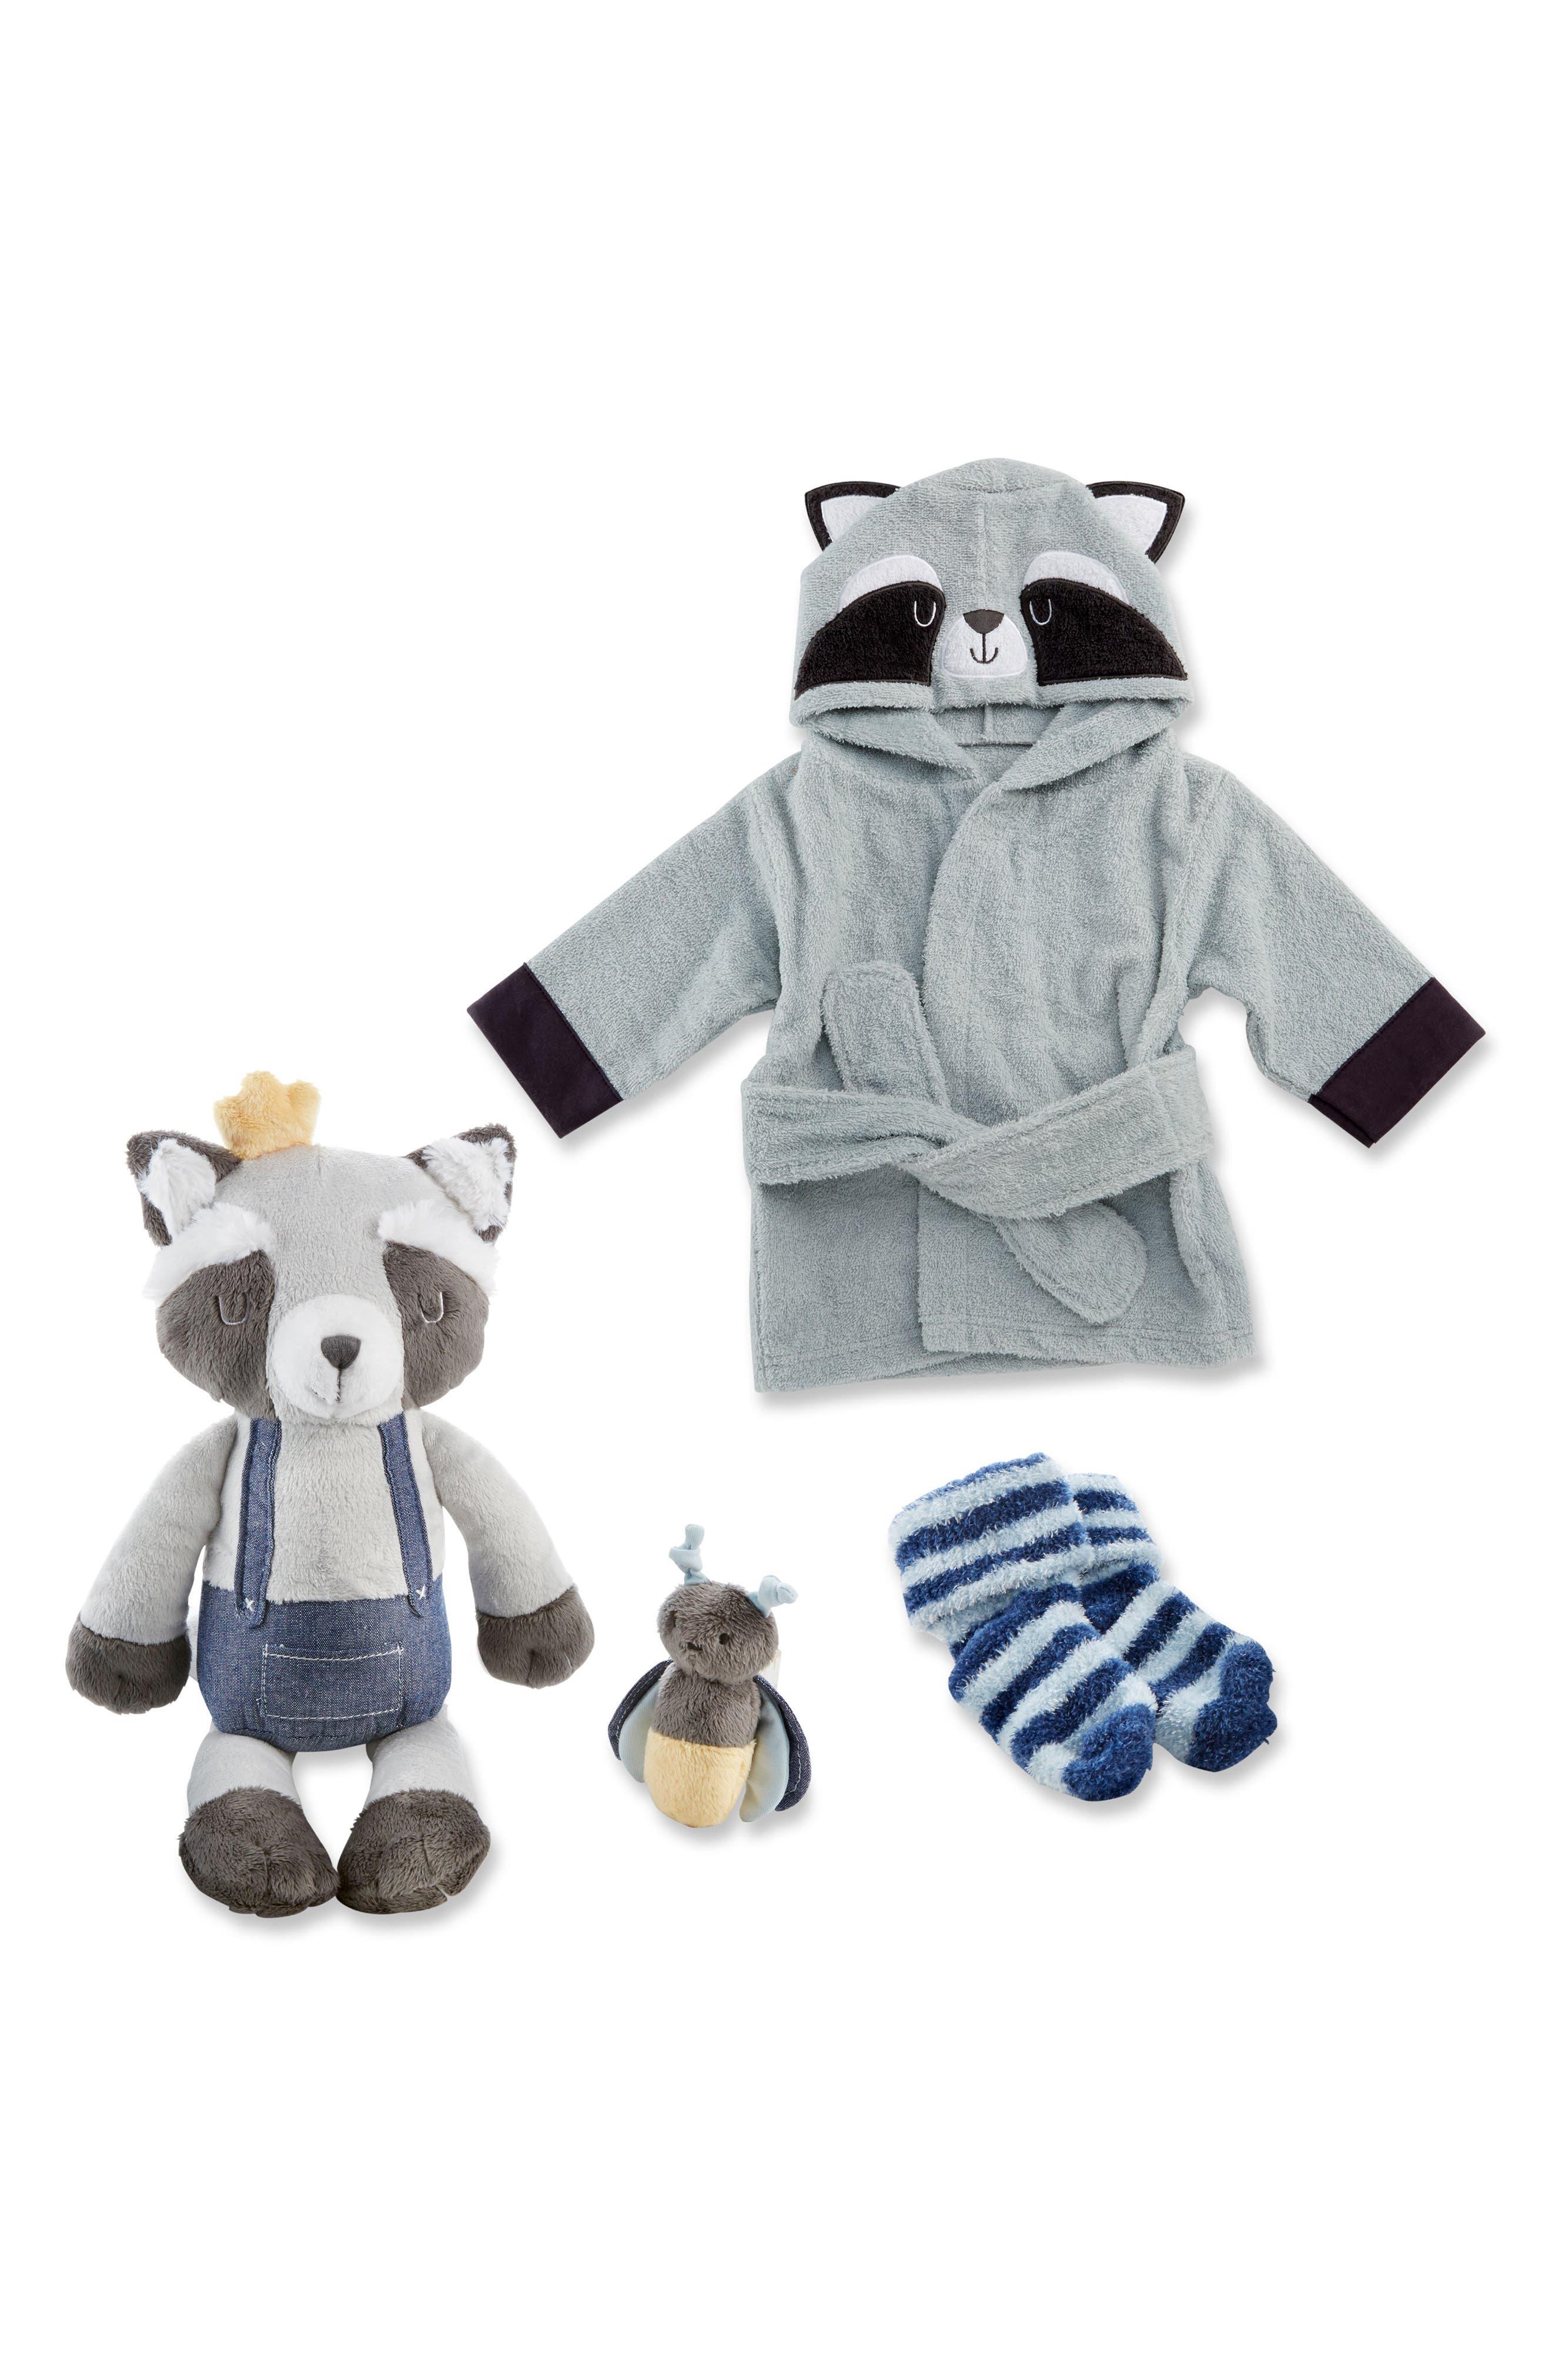 Forest Friends Raccoon Plush Robe, Fuzzy Socks, Stuffed Animal & Rattle Set,                         Main,                         color, Grey/ Blue/ White